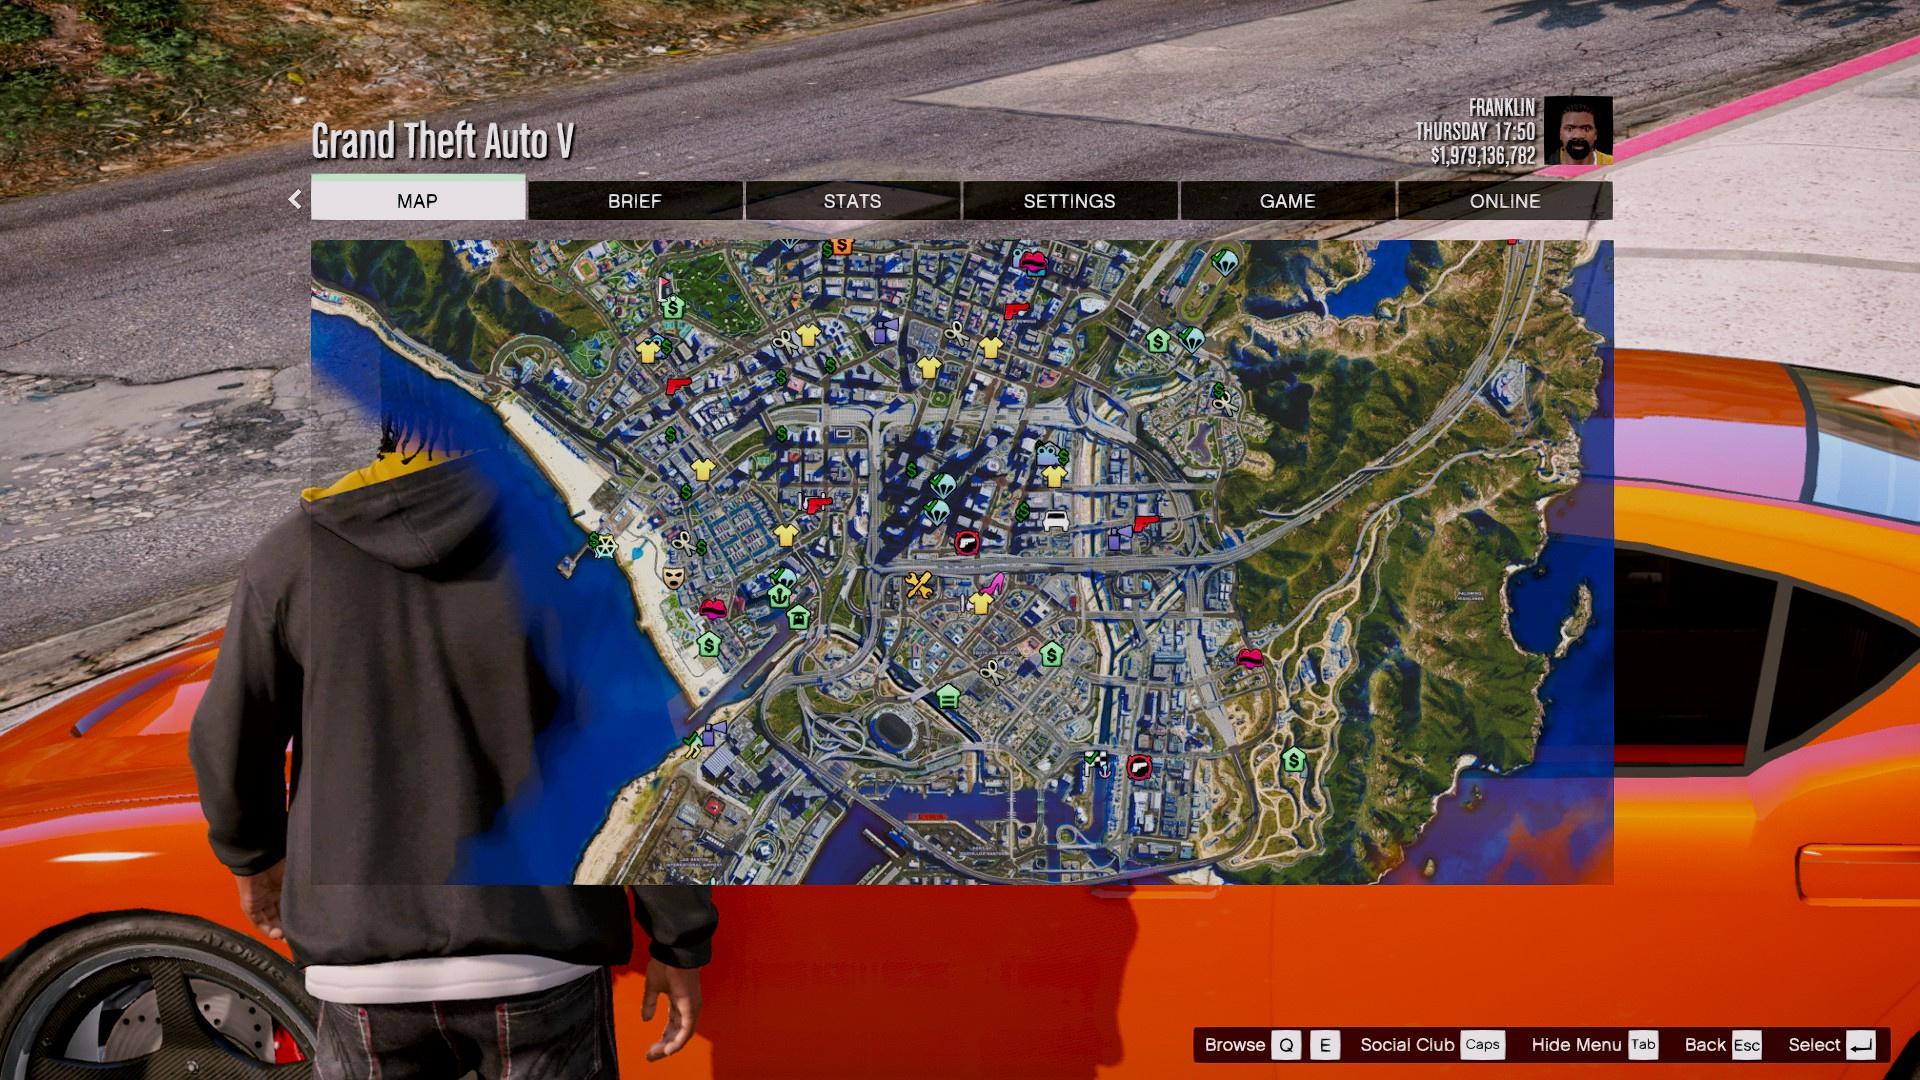 K Satellite View Map Bundled With Radar Mod Zoom Script GTA - World map satellite view video